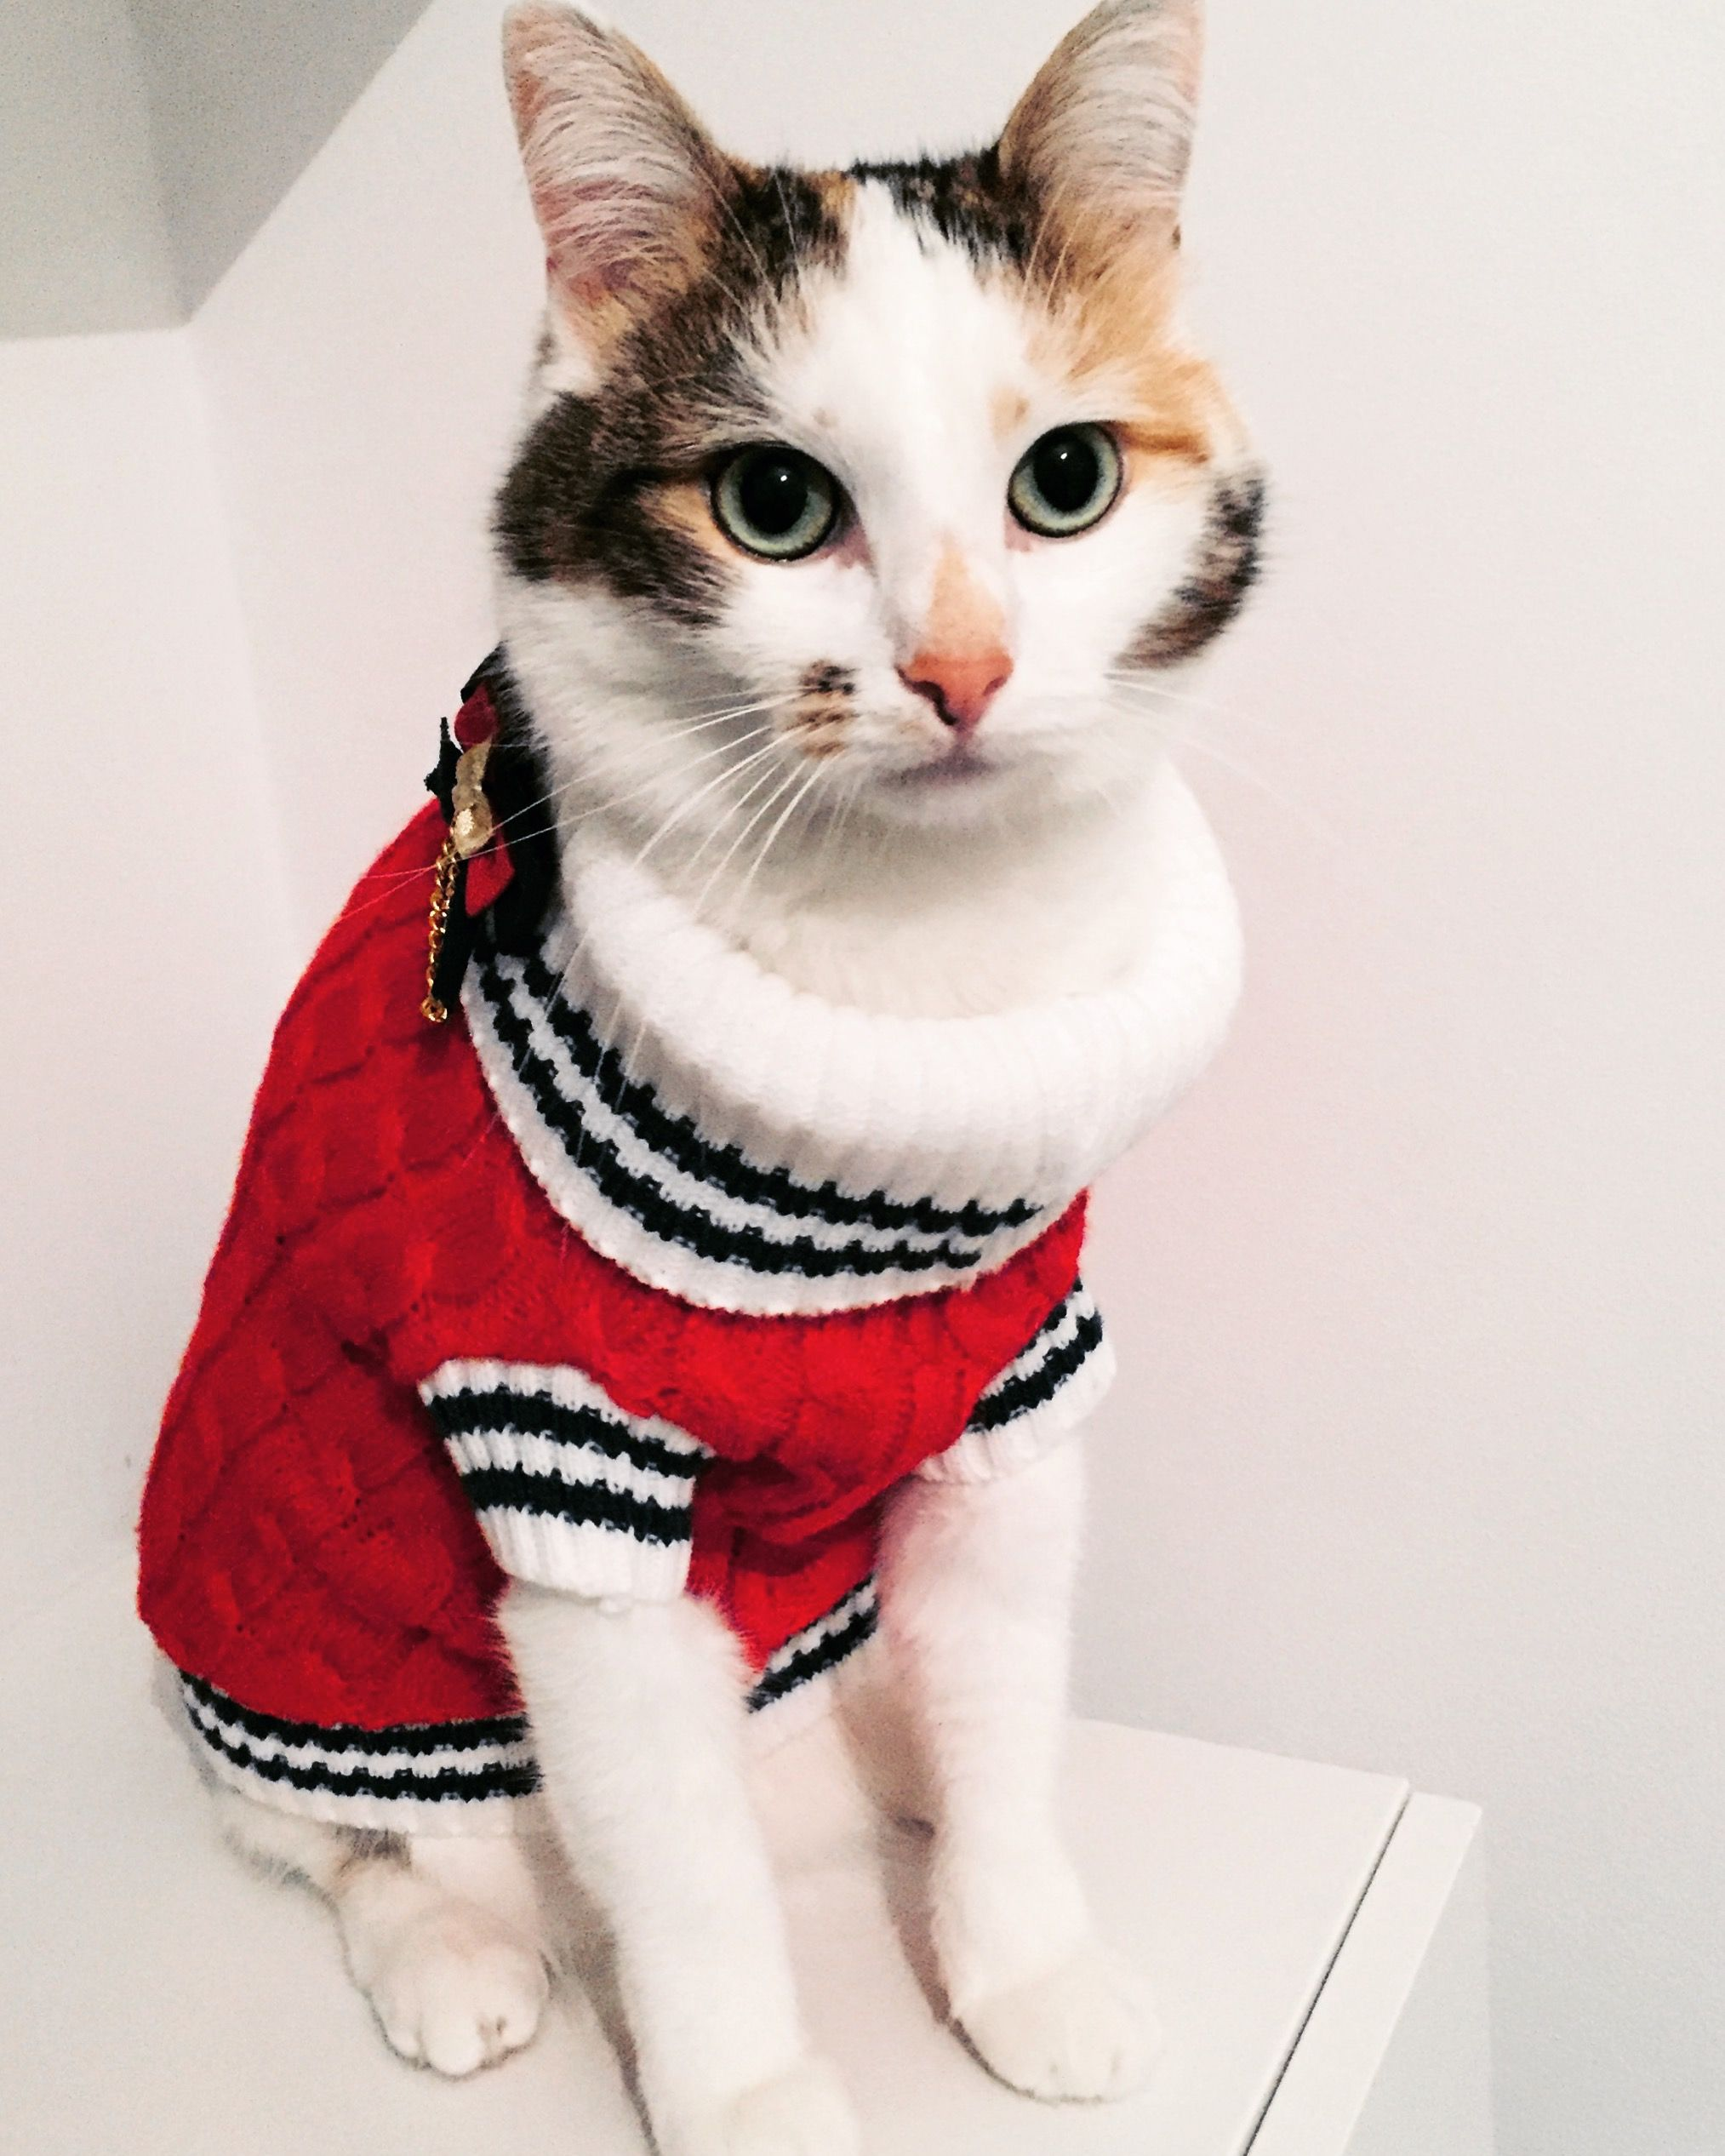 Hundepulli Pullover Für Hunde Sweatshirts Hund Kleidung Hundejacke